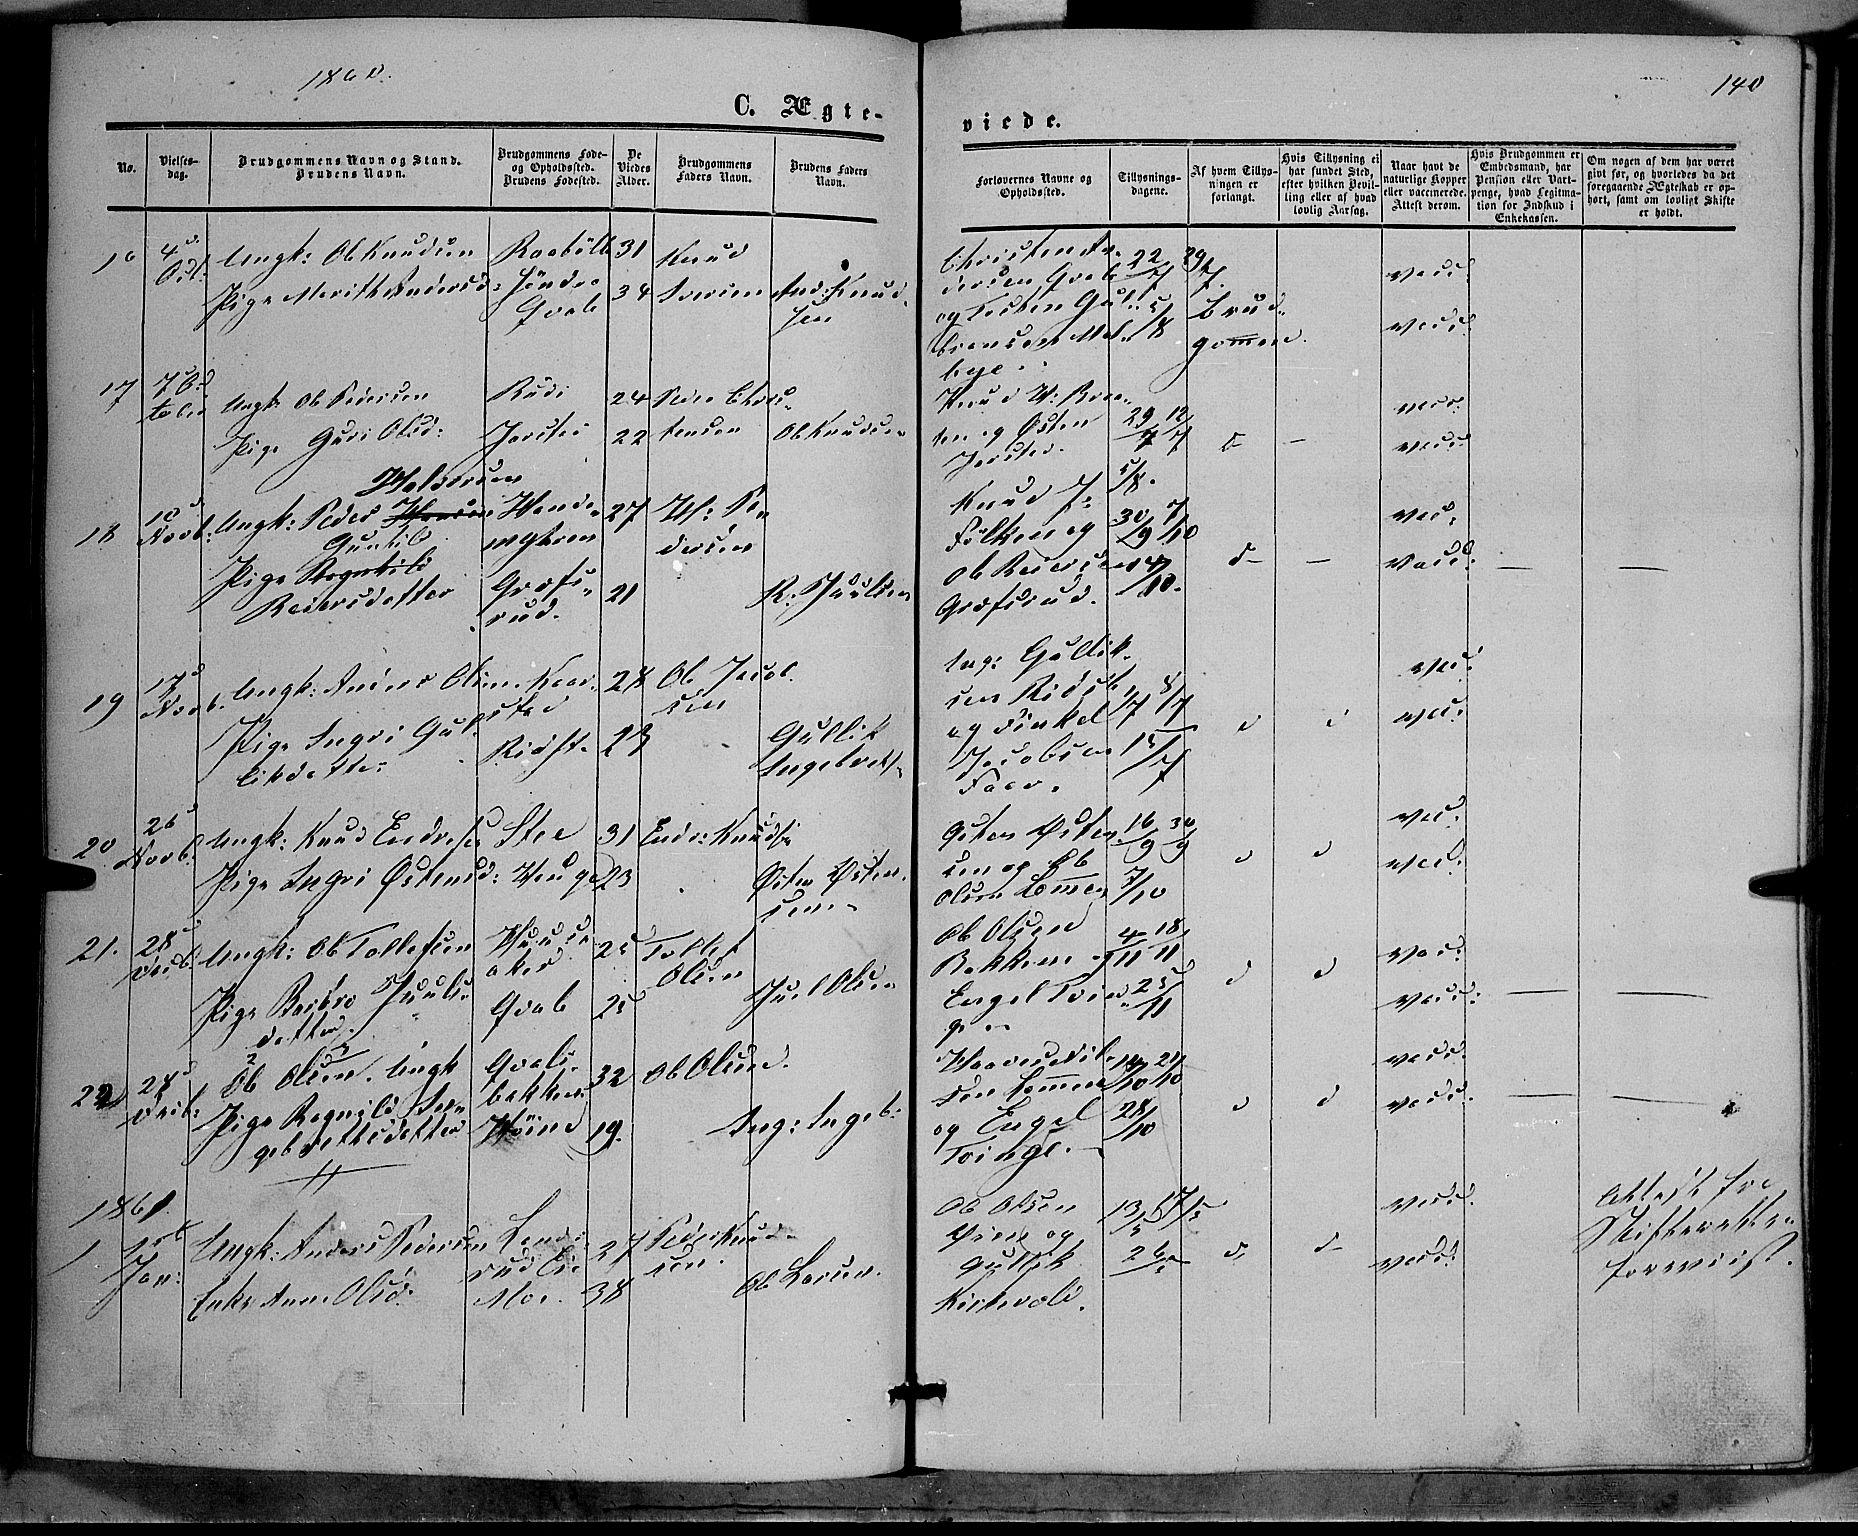 SAH, Vestre Slidre prestekontor, Ministerialbok nr. 2, 1856-1864, s. 140